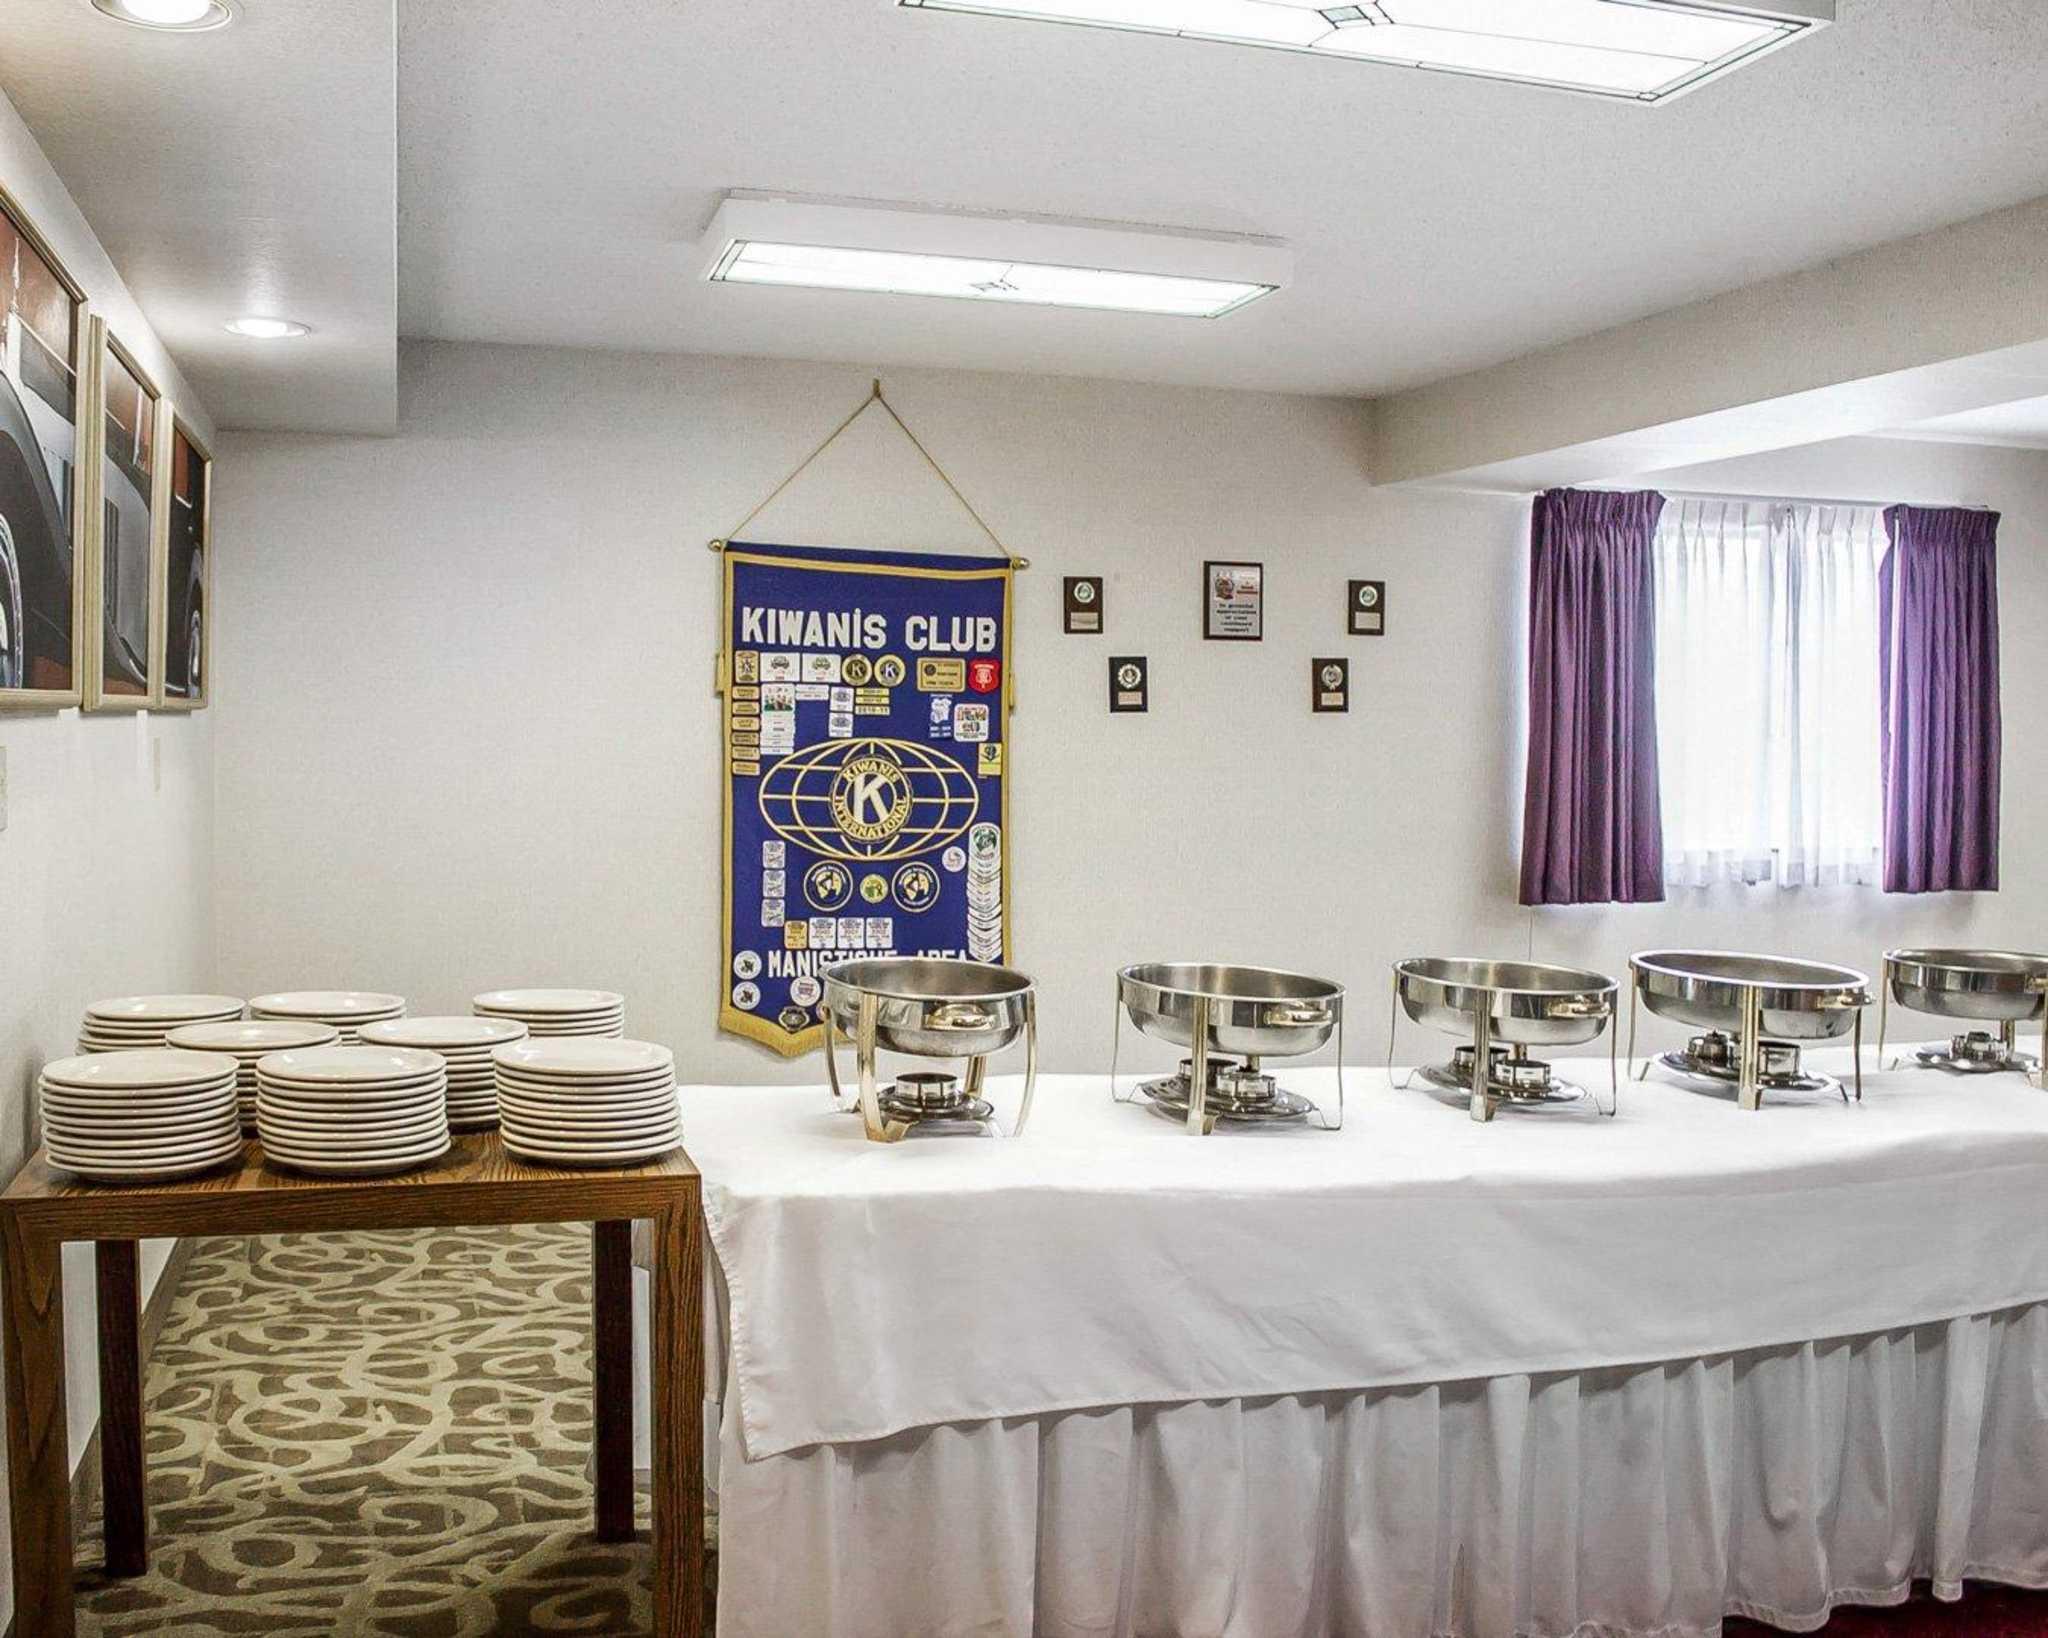 Hotels Motels With Smoking Room Near I Michigan